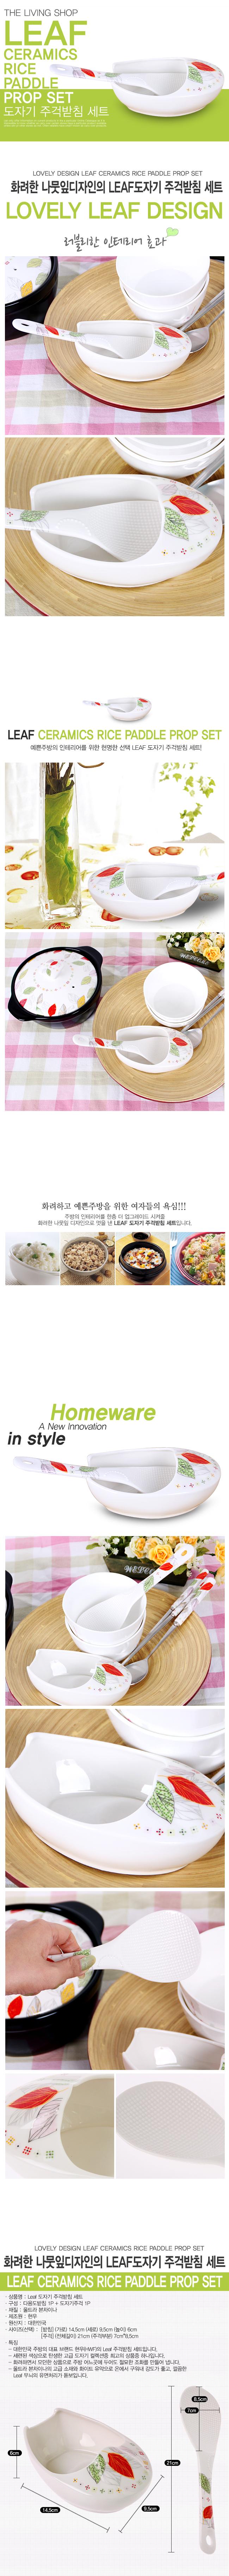 Leaf_ricepaddlecoaster.jpg